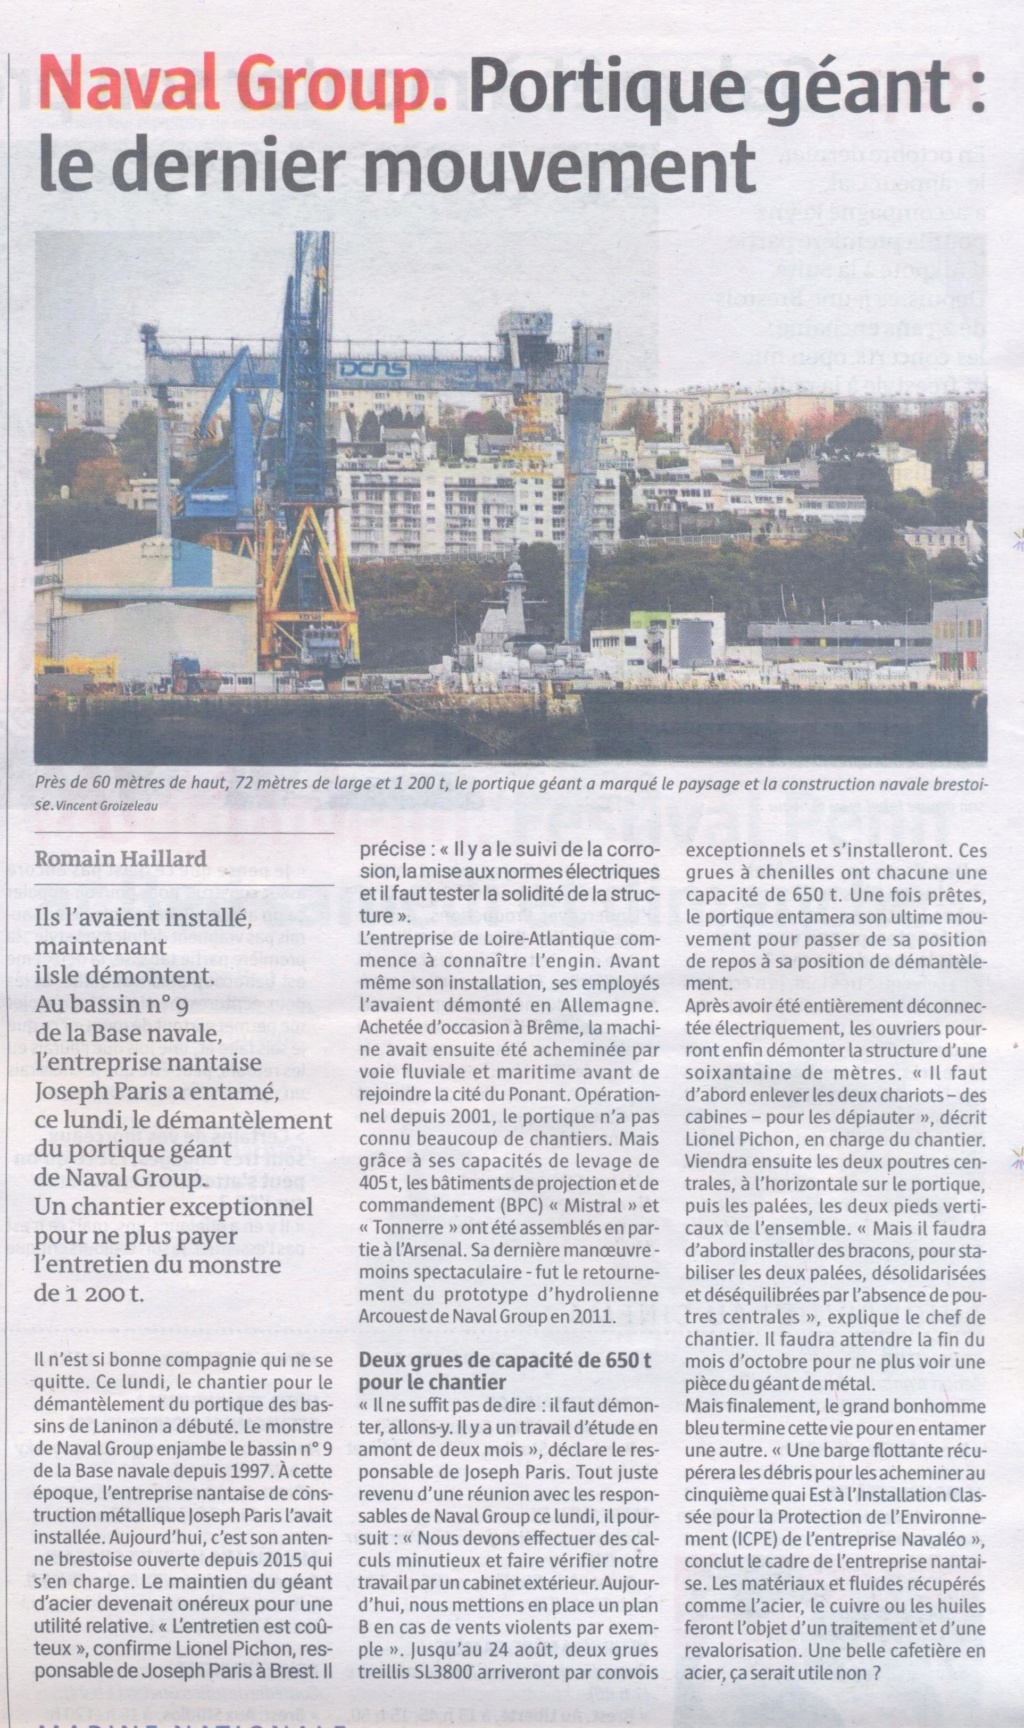 [Vie des ports] BREST Ports et rade - Volume 001 - Page 36 Dcan_010